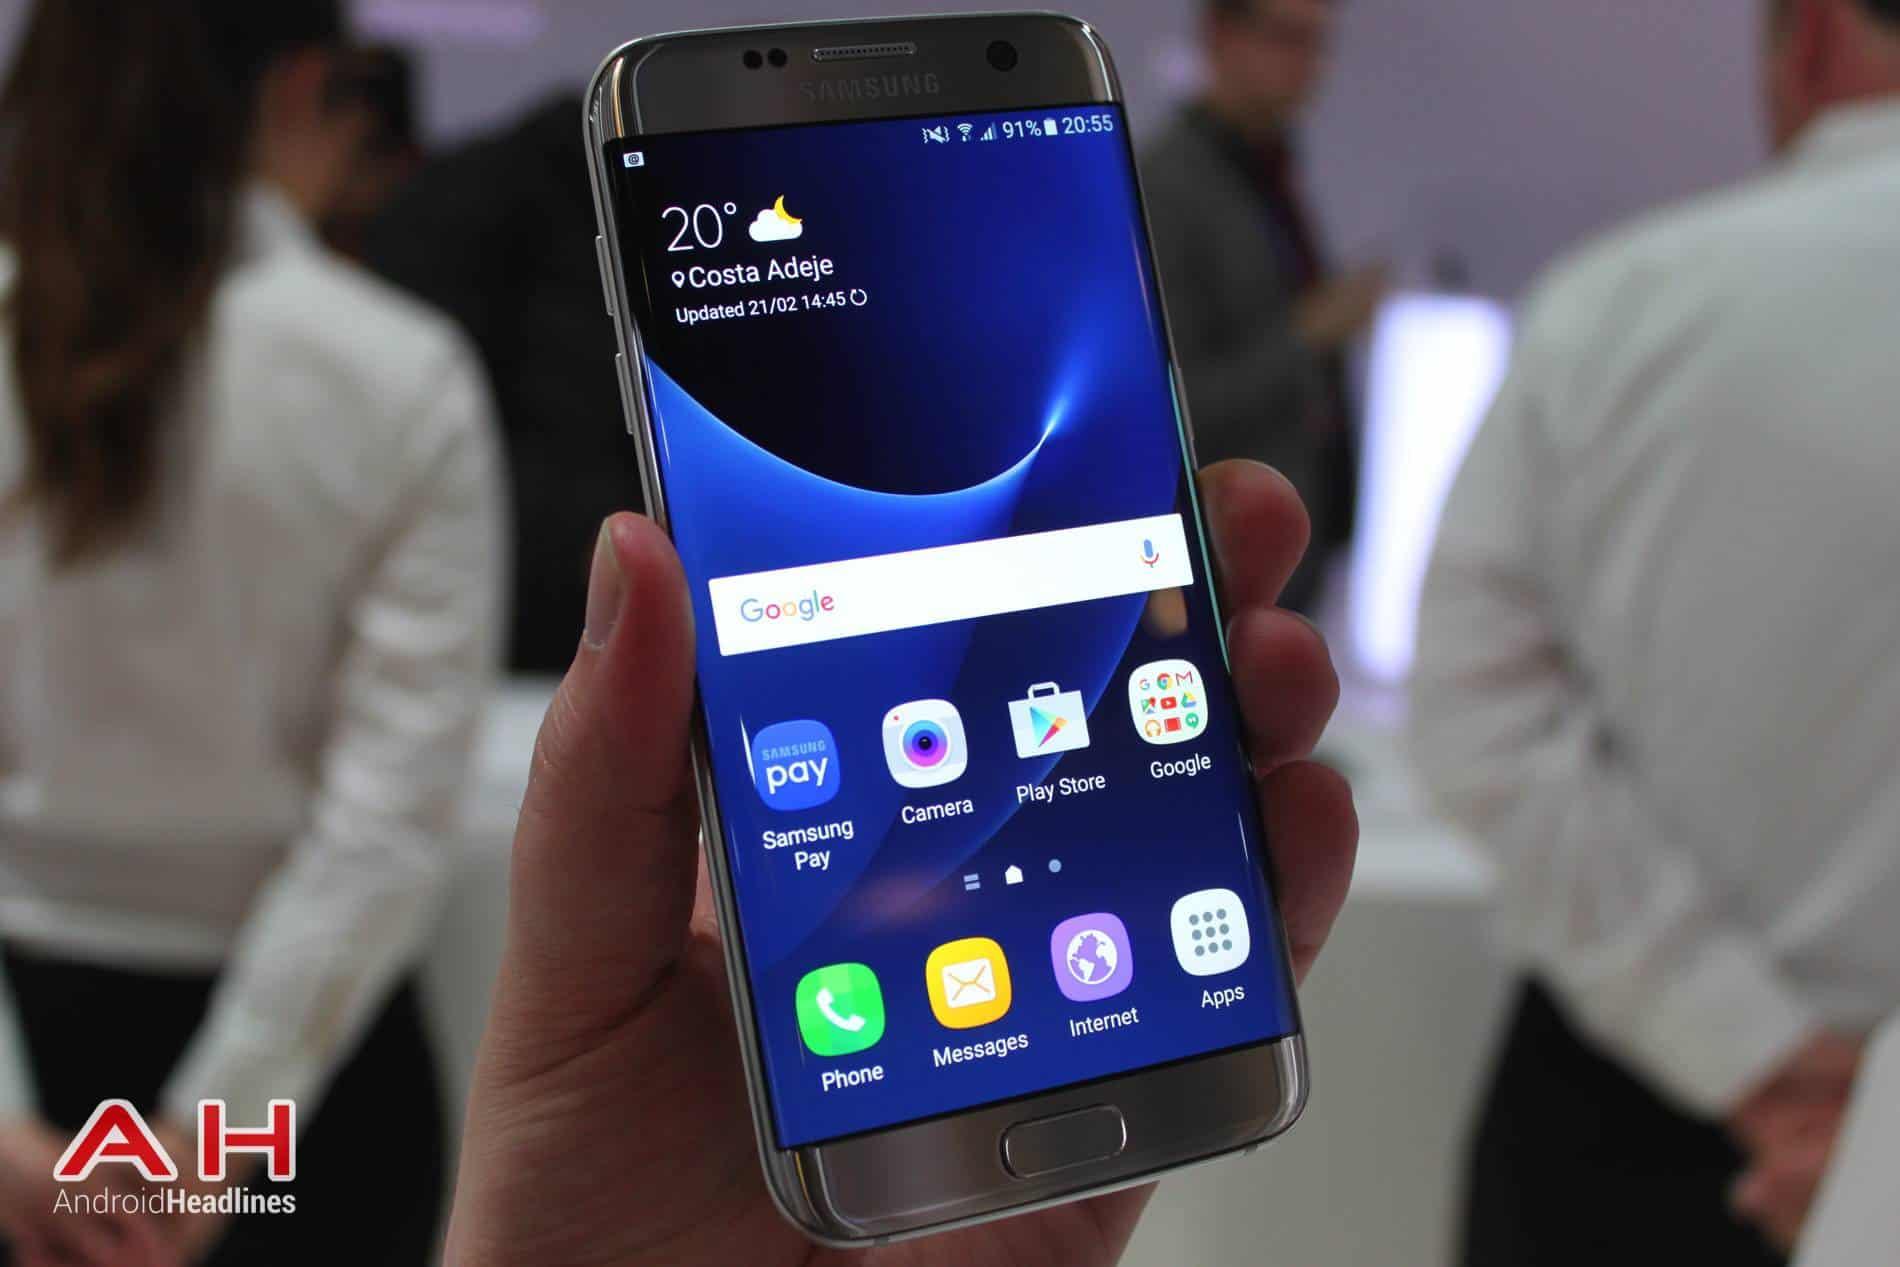 Galaxy S7 Edge MWC AH 31